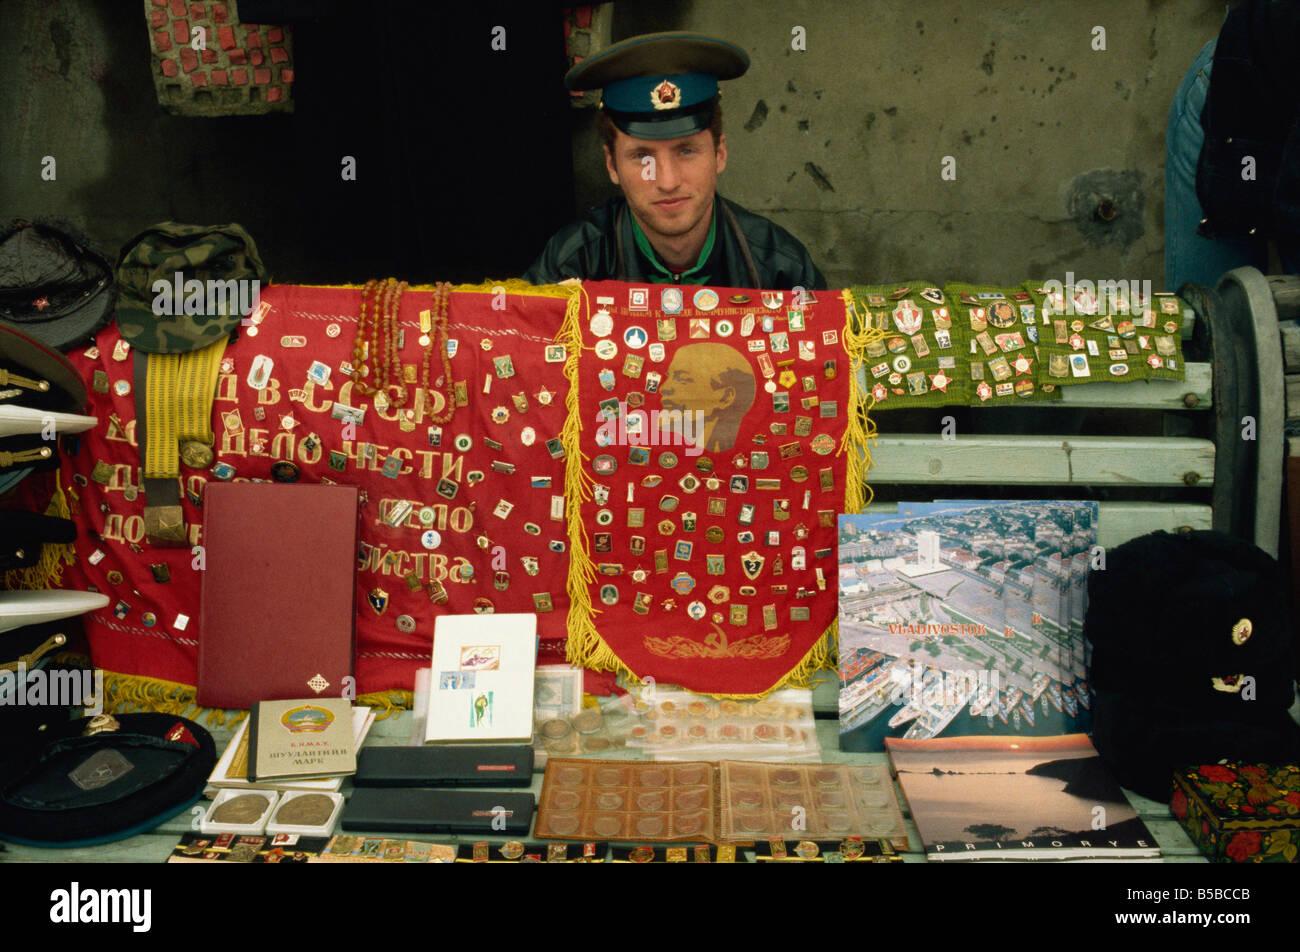 Vendedor de souvenirs Vladivostok Lejano Oriente ruso Rusia Europa Imagen De Stock